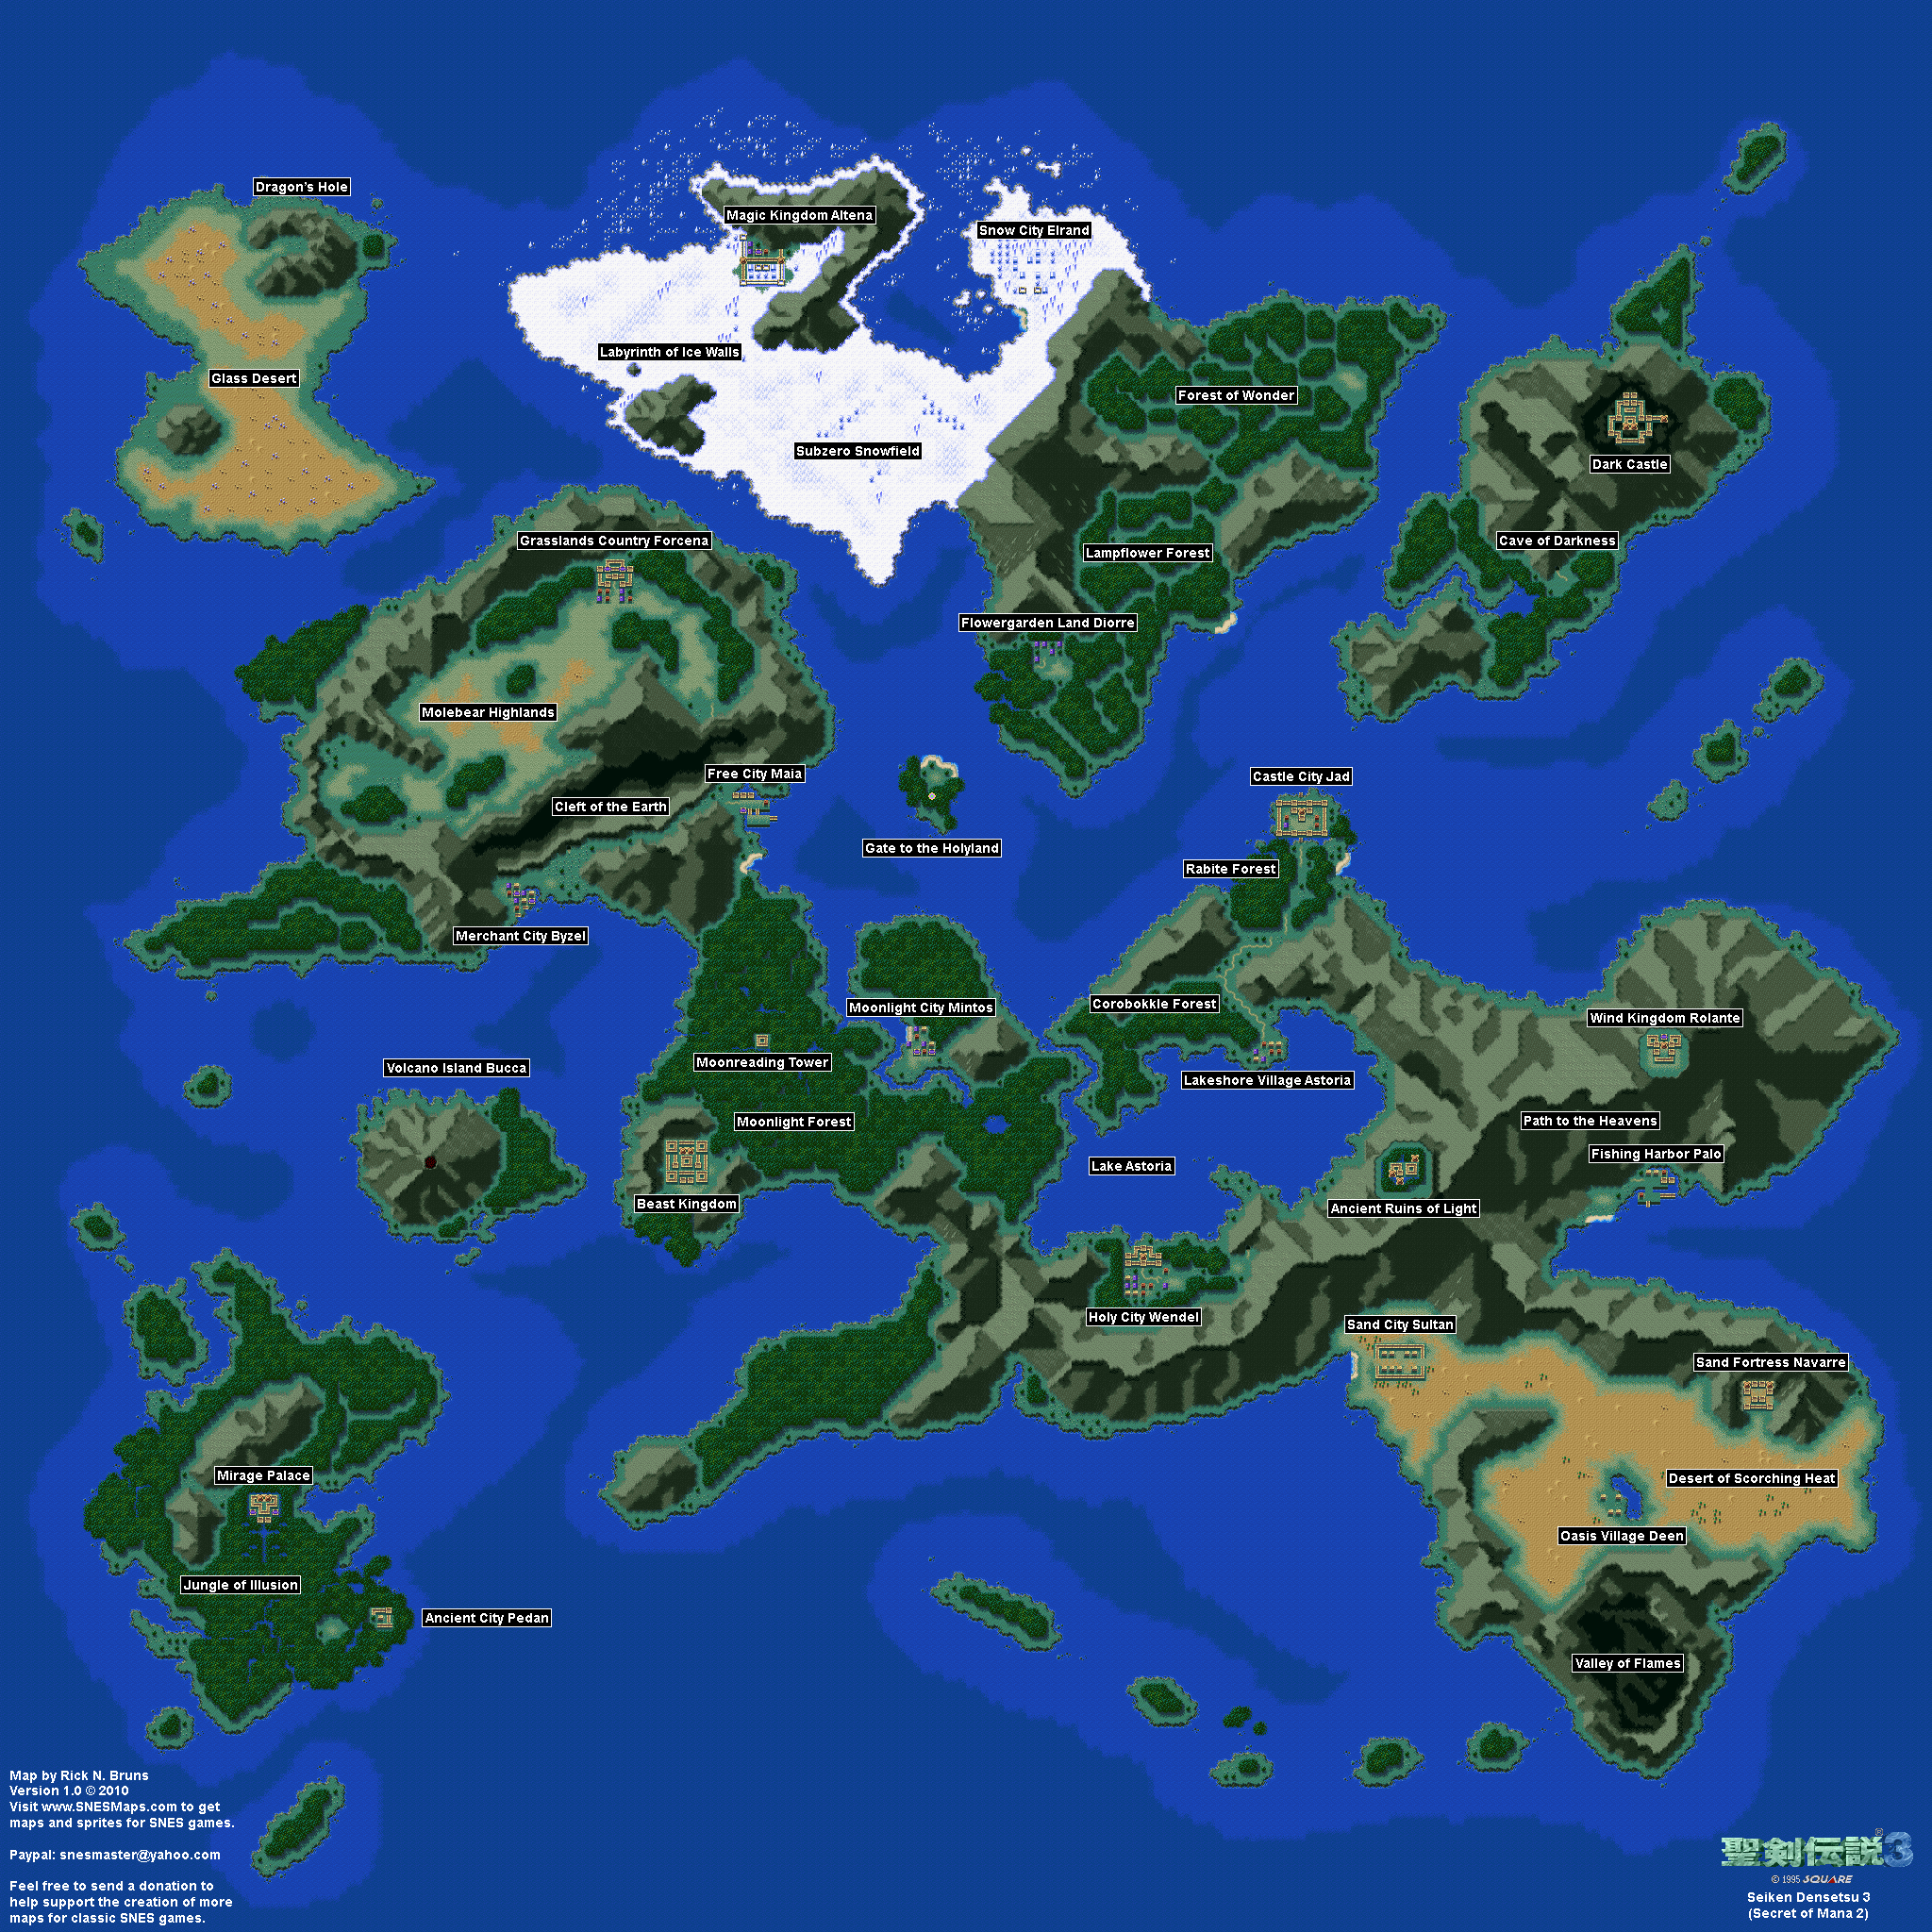 Seiken Densetsu 3 (Secret of Mana 2) - Overworld Super Nintendo SNES on secret of mana world map, forest map, nether map, communist country map, dark world map, second life map, death mountain map, persistent world map, deserted island map, misery mire map, puget sound region map, loz world map, line of sight map, wind waker hd map, greater boston area map, kakariko village map, ultima map, fictional world map,